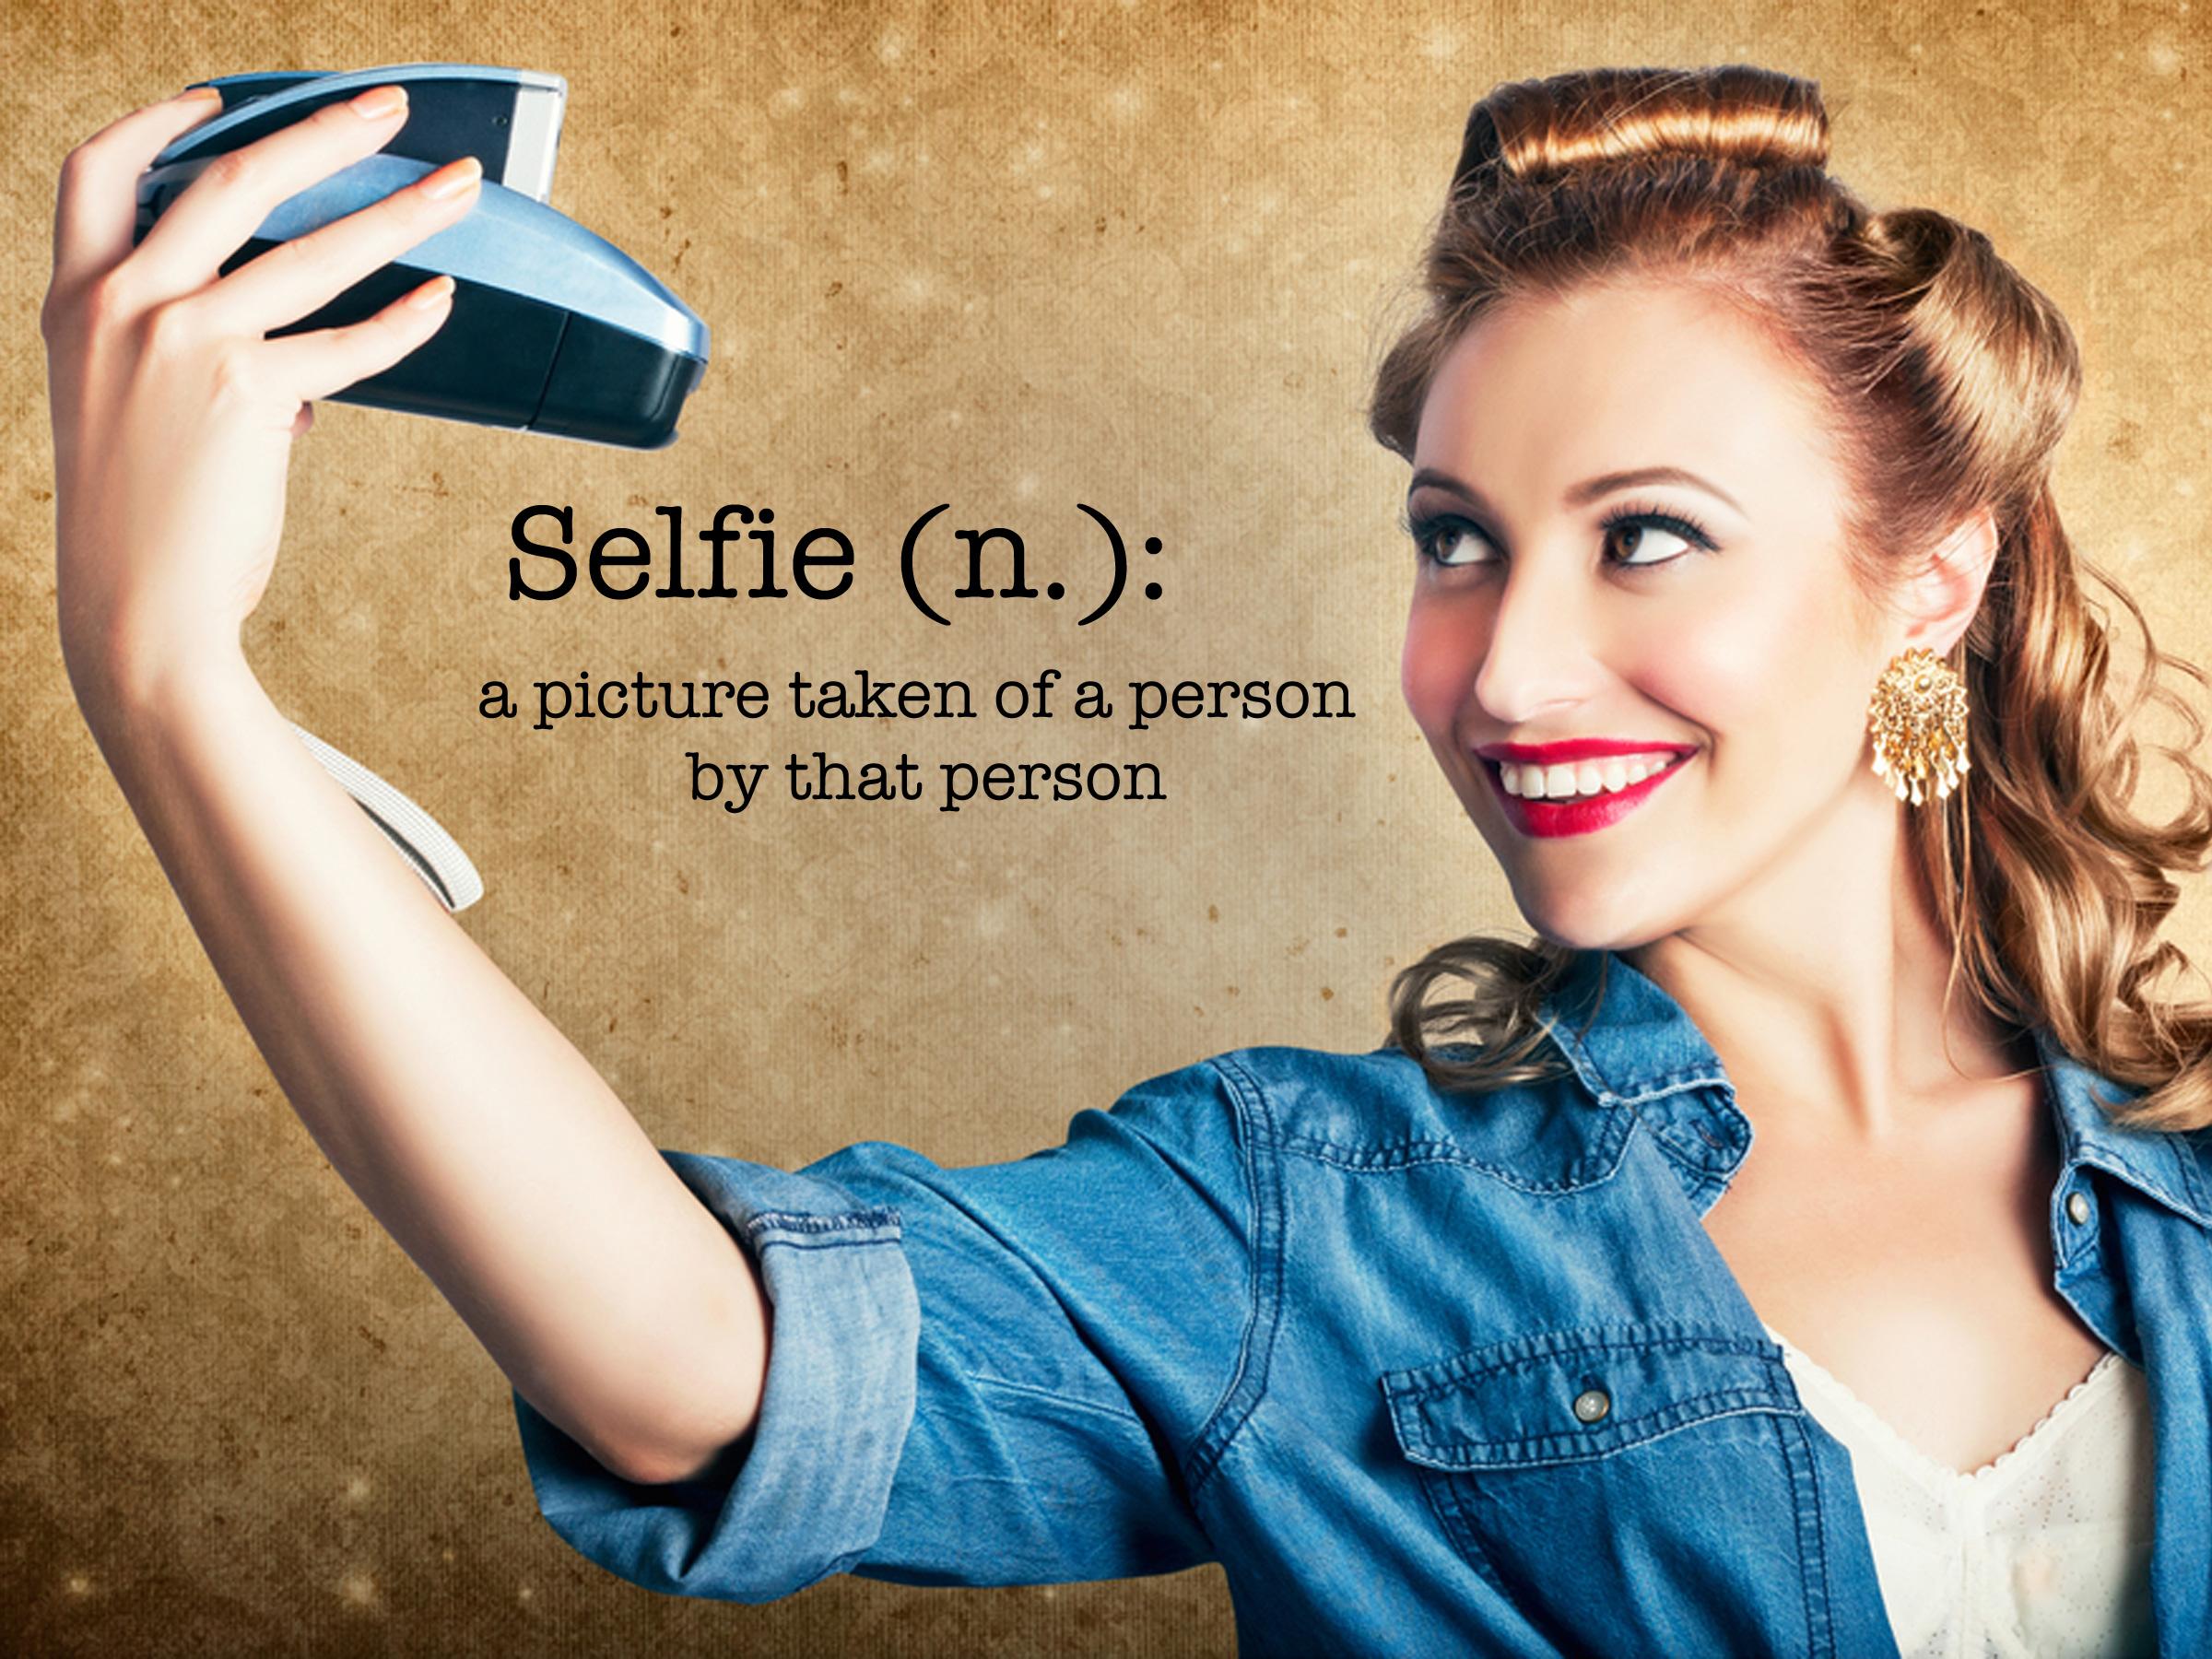 Facebook mo¿e weryfikowaæ konta za pomoc± selfie